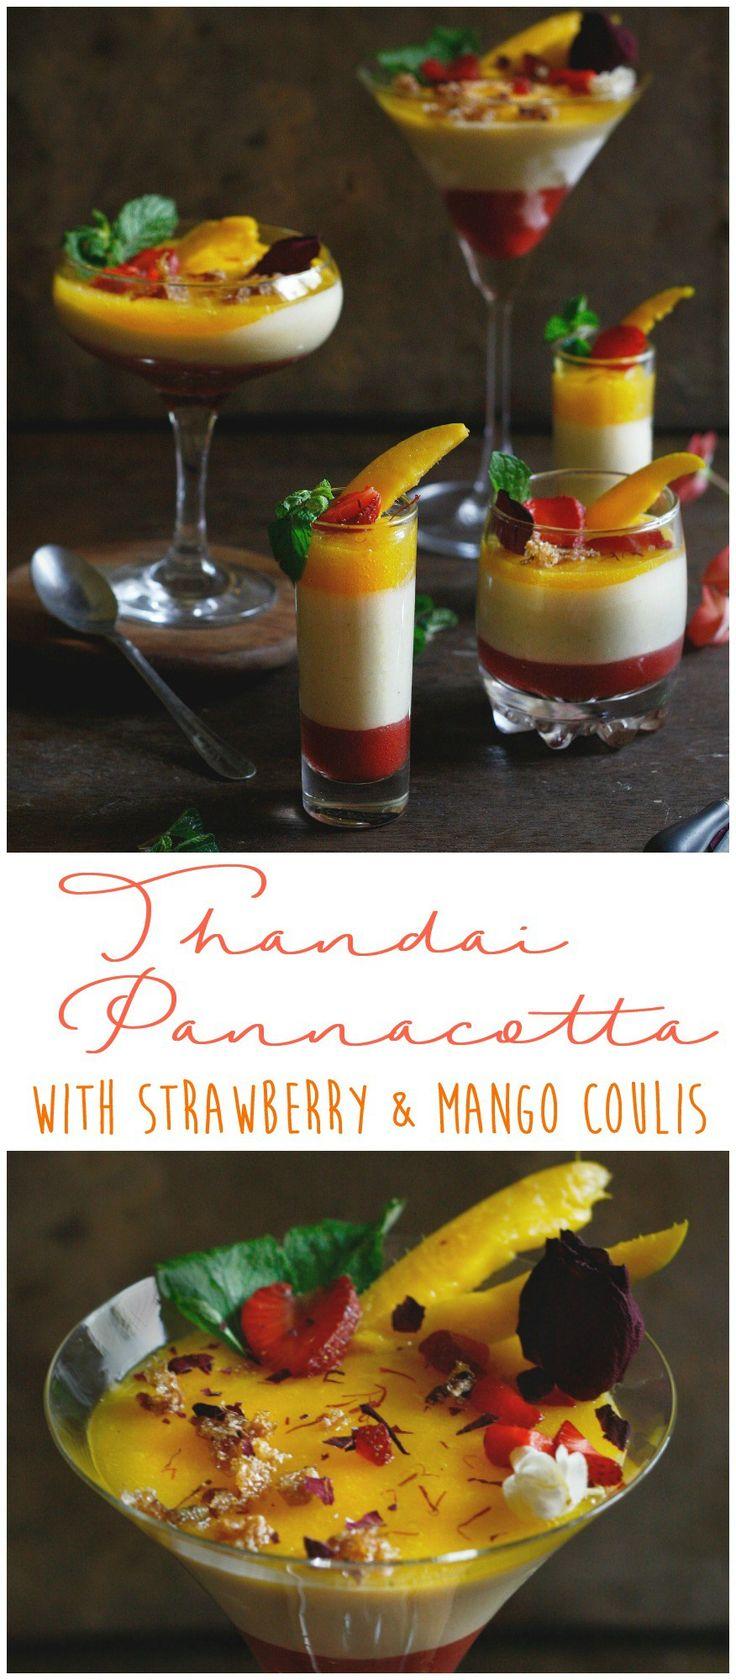 Thandai (spiced Almond Milk) pannacotta with strawberry and mango coulis is ever… d216bbfec04b337c7fe56d9cdba41095  make ahead desserts summer desserts